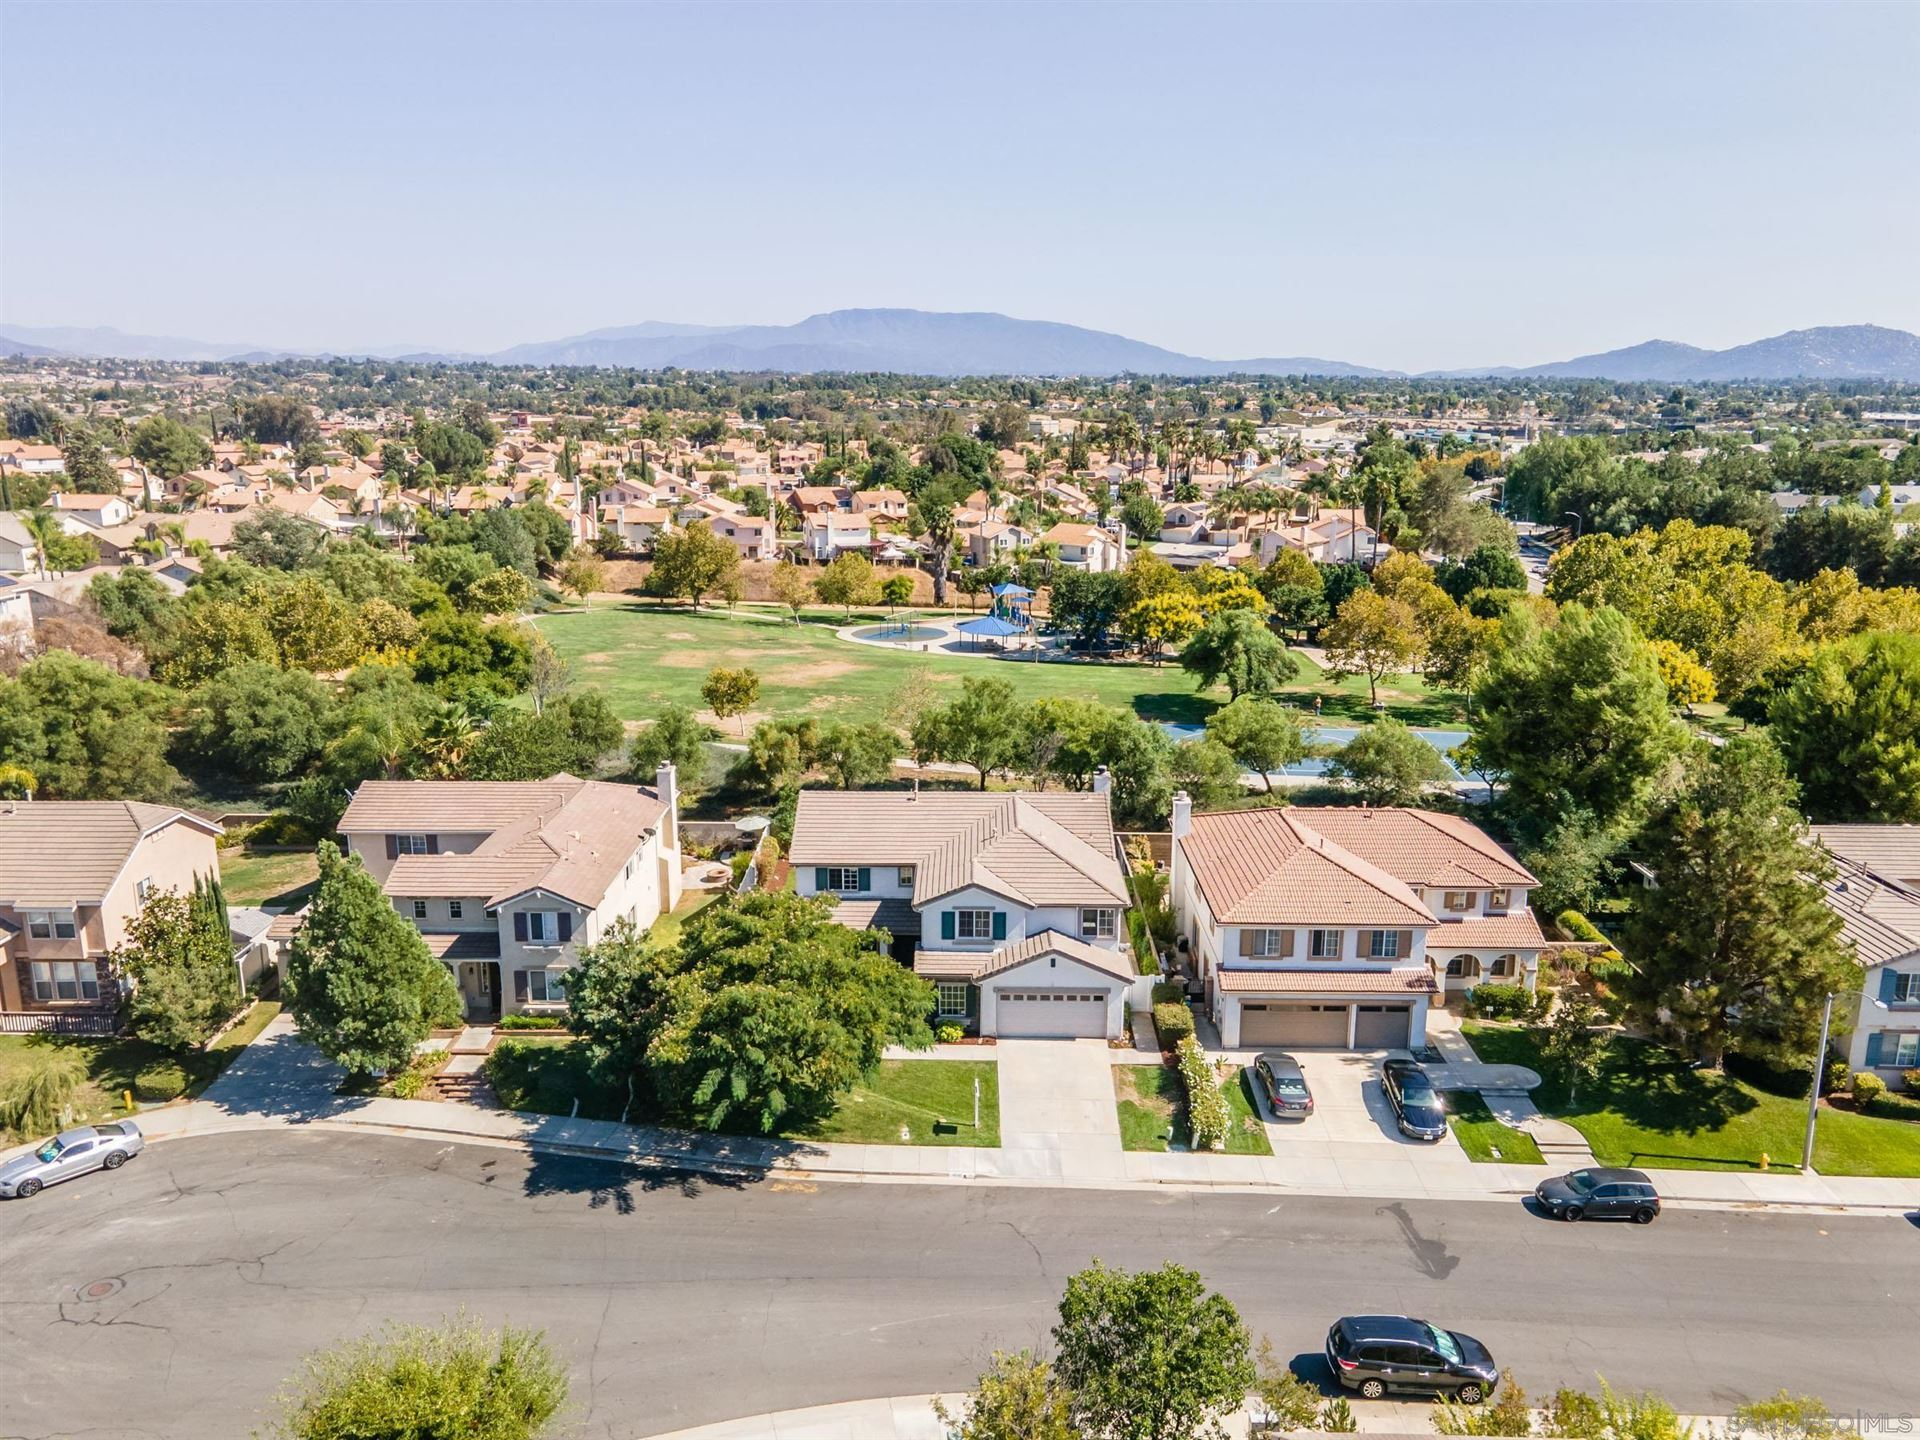 Photo for 27147 Greenstone St, Temecula, CA 92591 (MLS # 210026084)